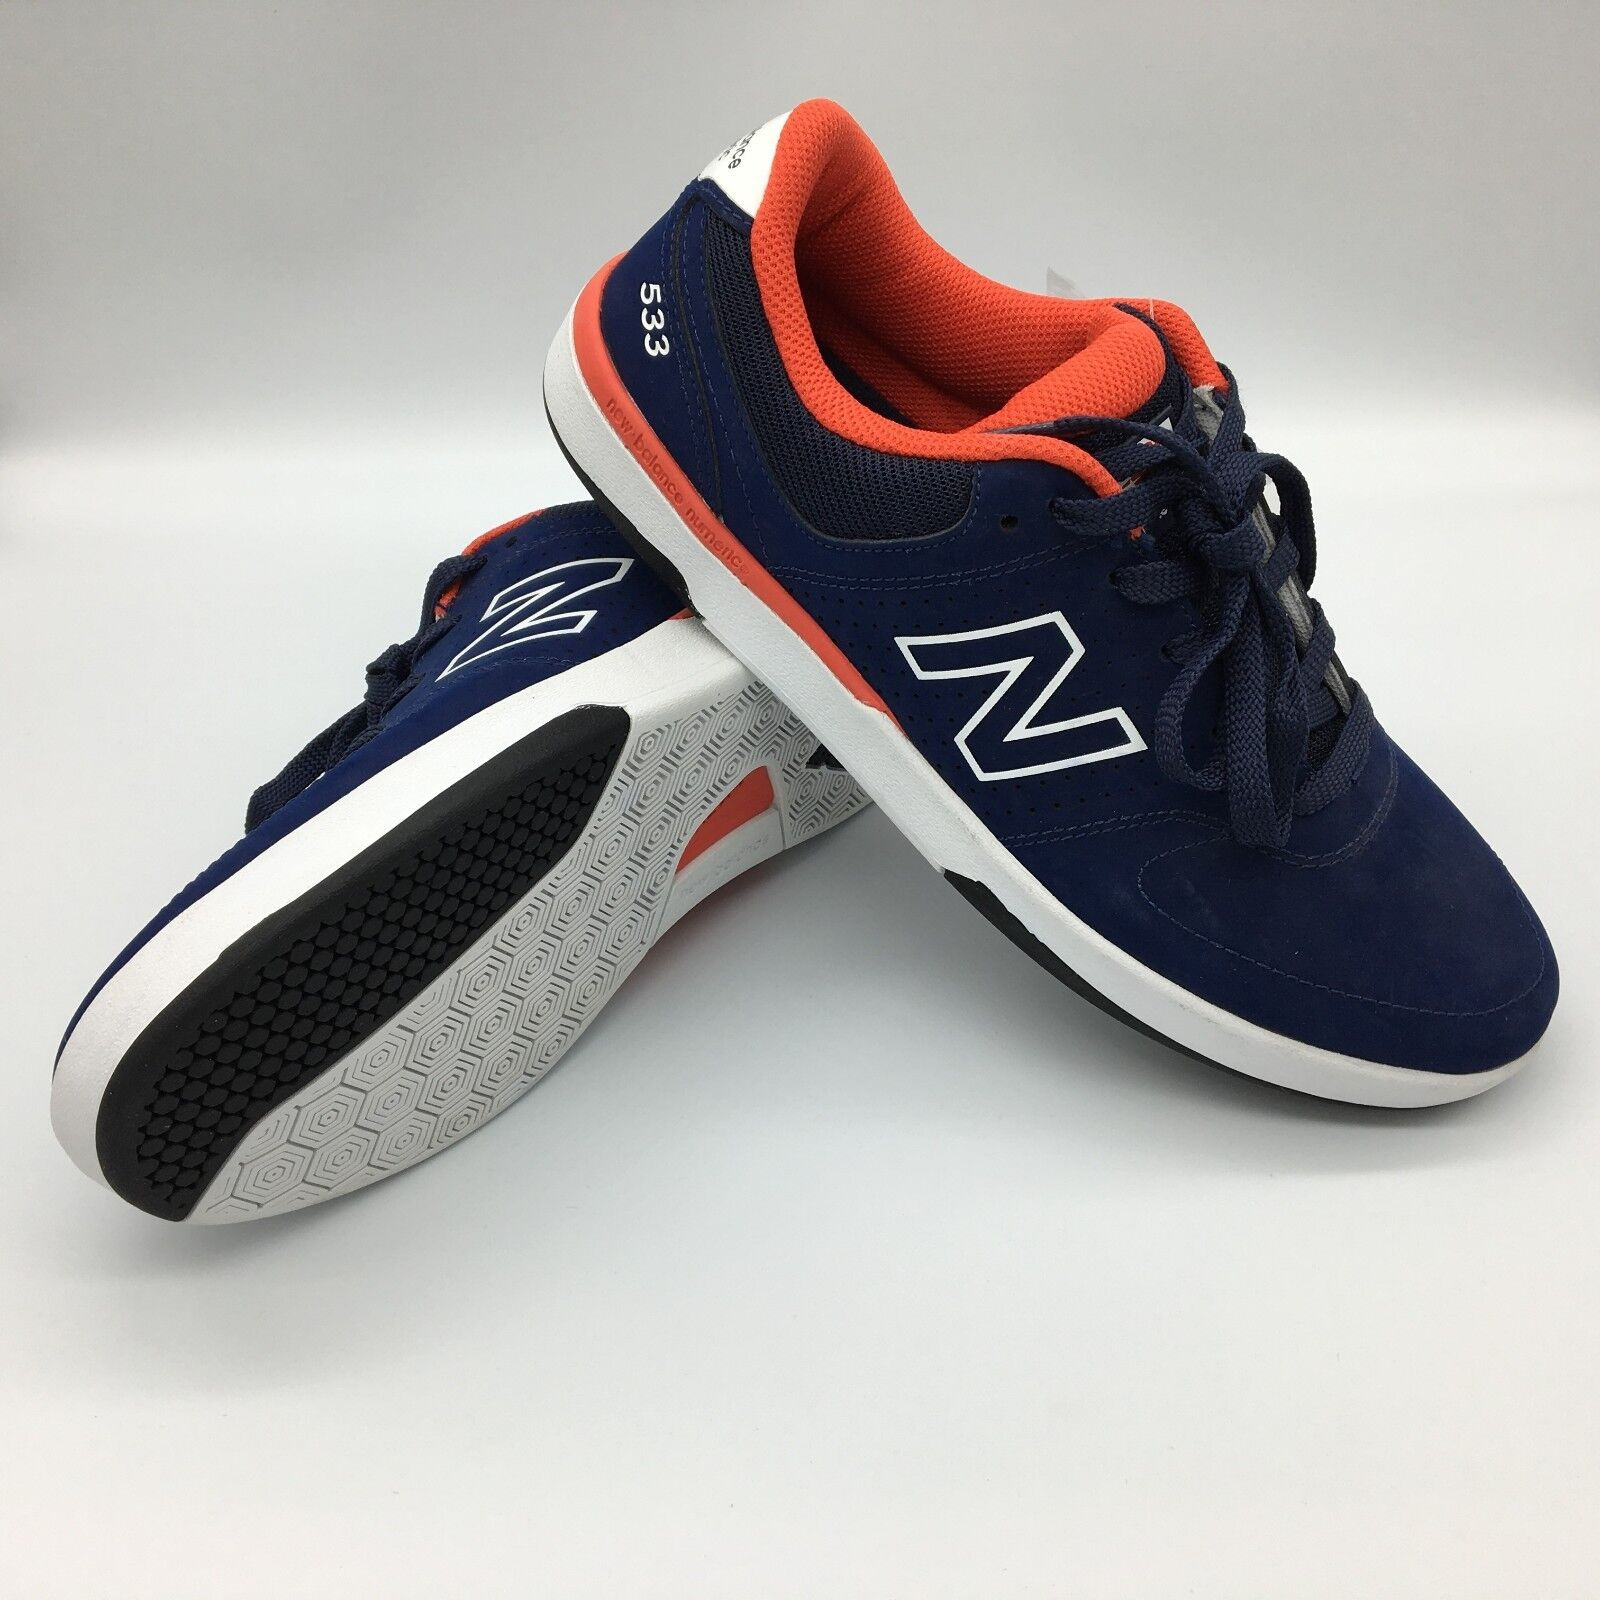 New Balance Numeric NM533ABR PJ Ladd 533 v2 Navy Men's Size US 9.5 Athletic PBW